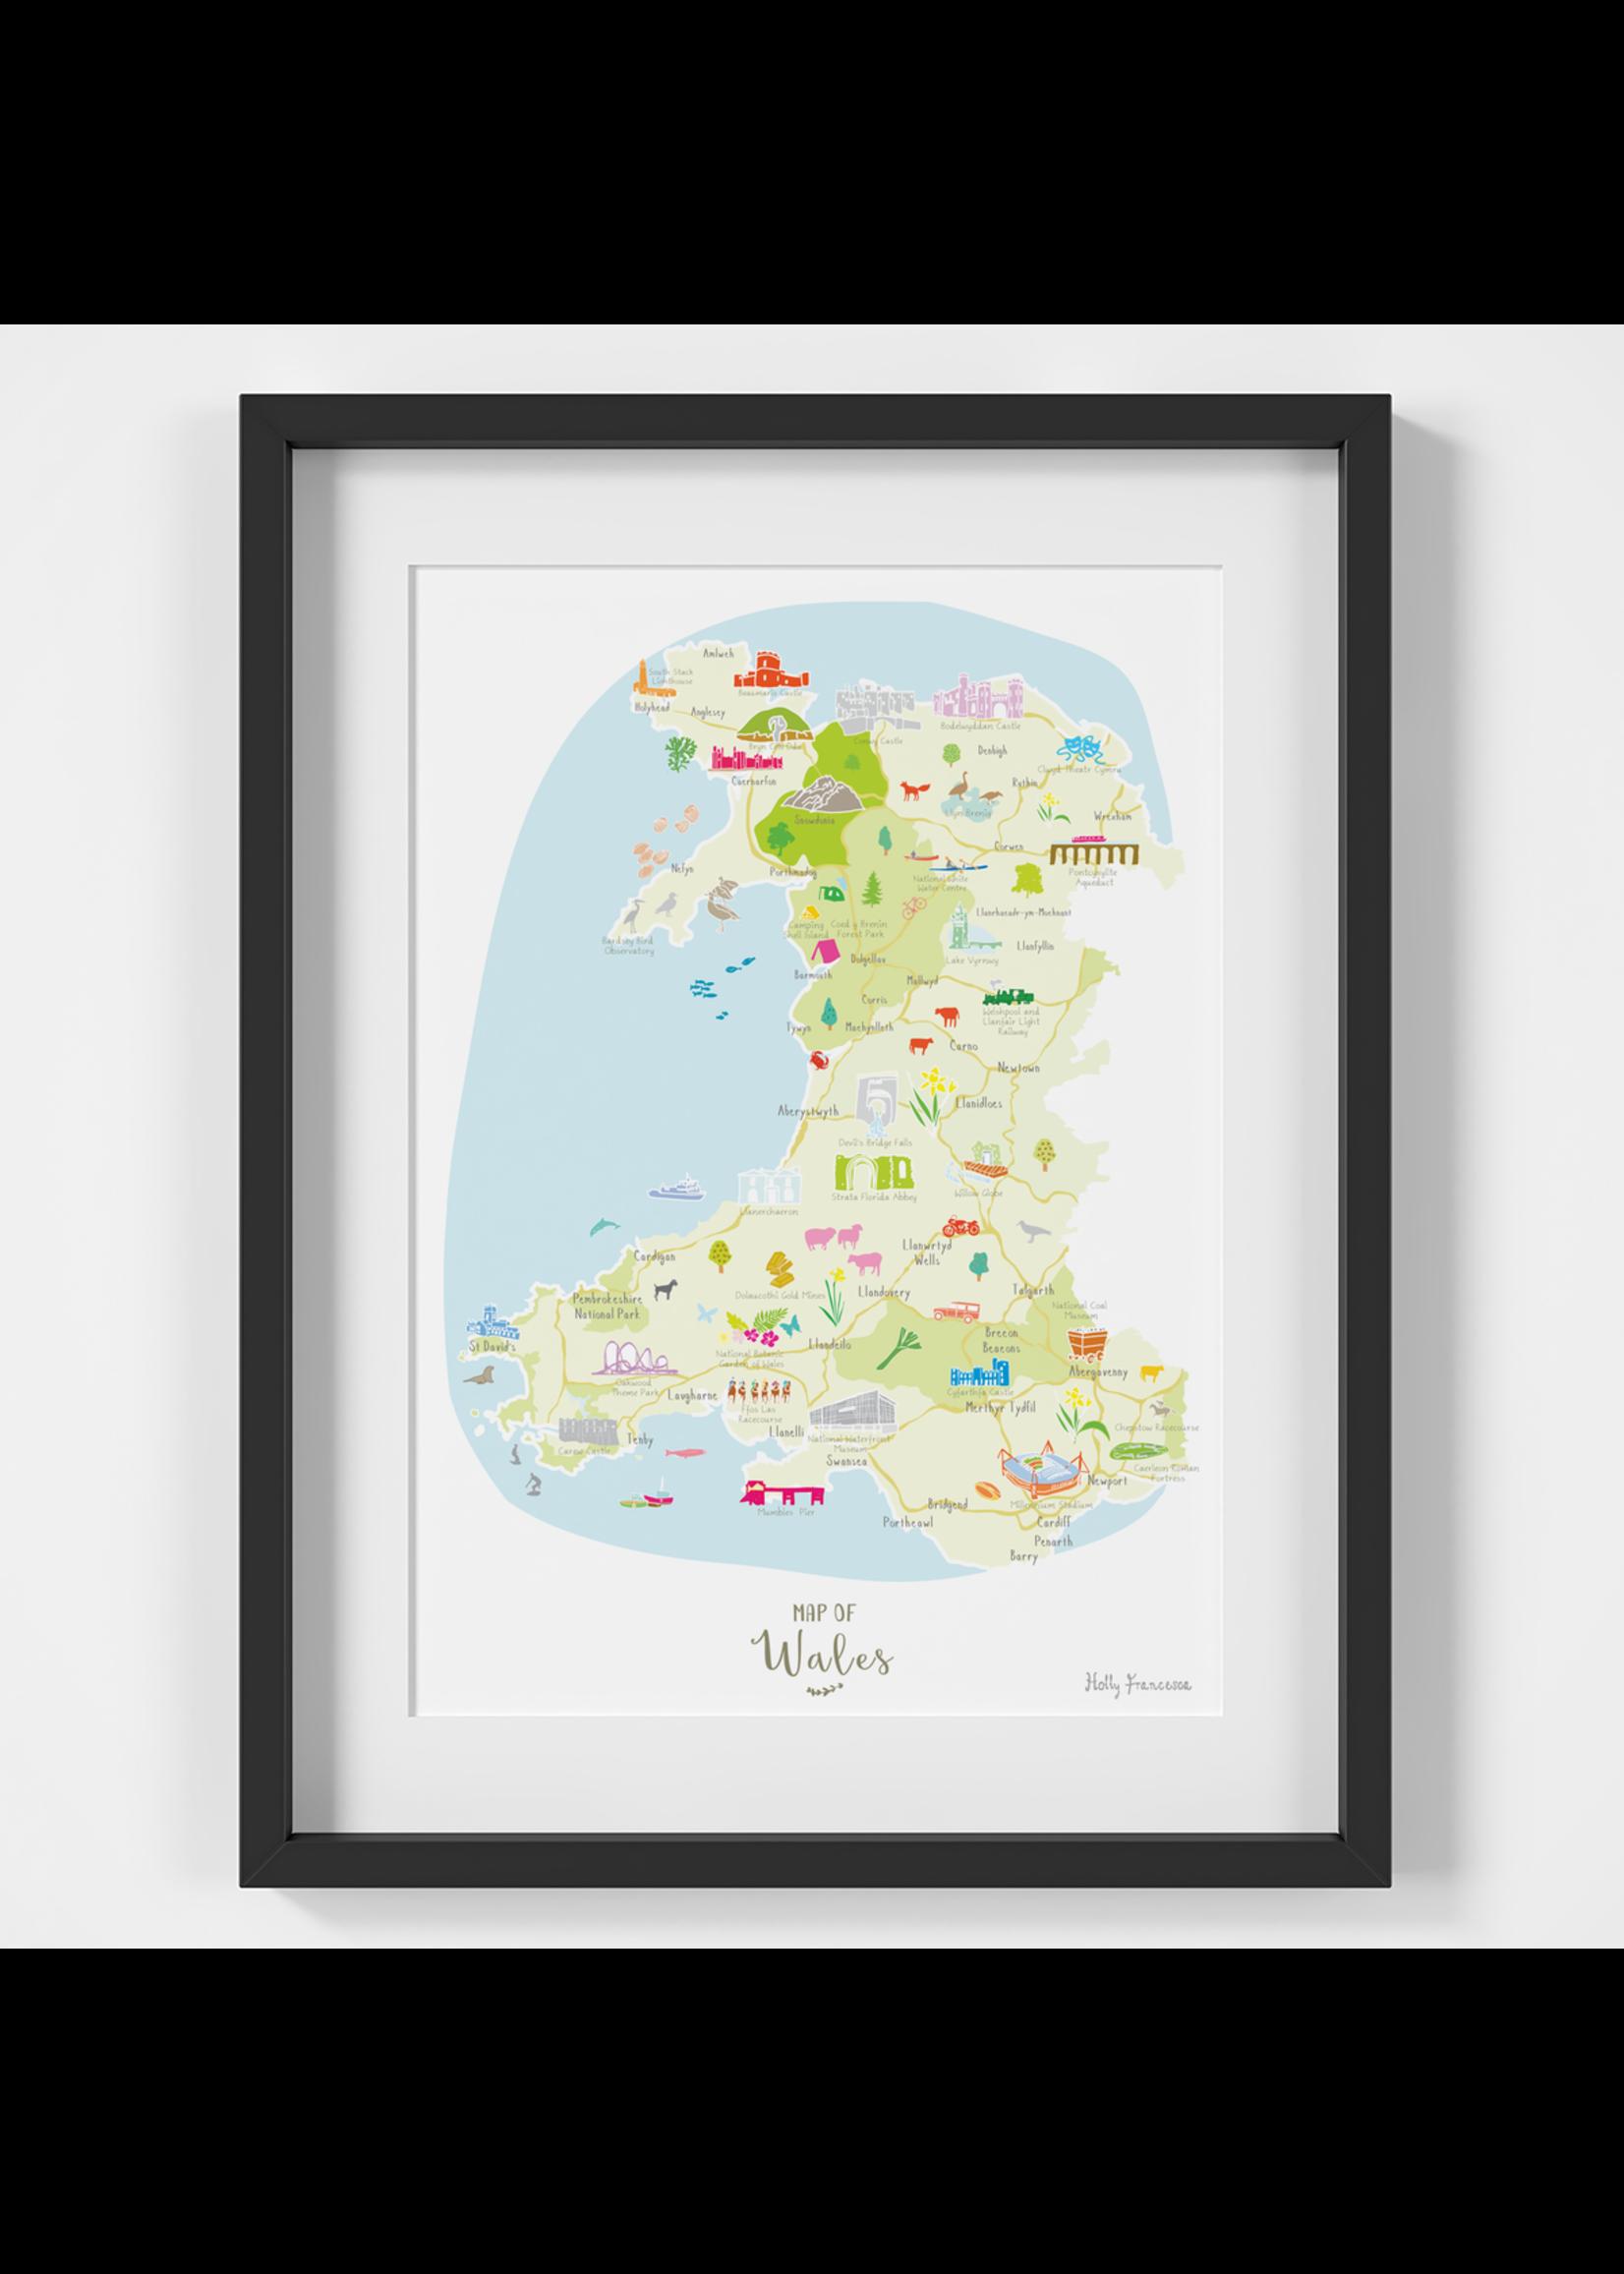 Holly Francesca Holly Francesca Map of Wales A4